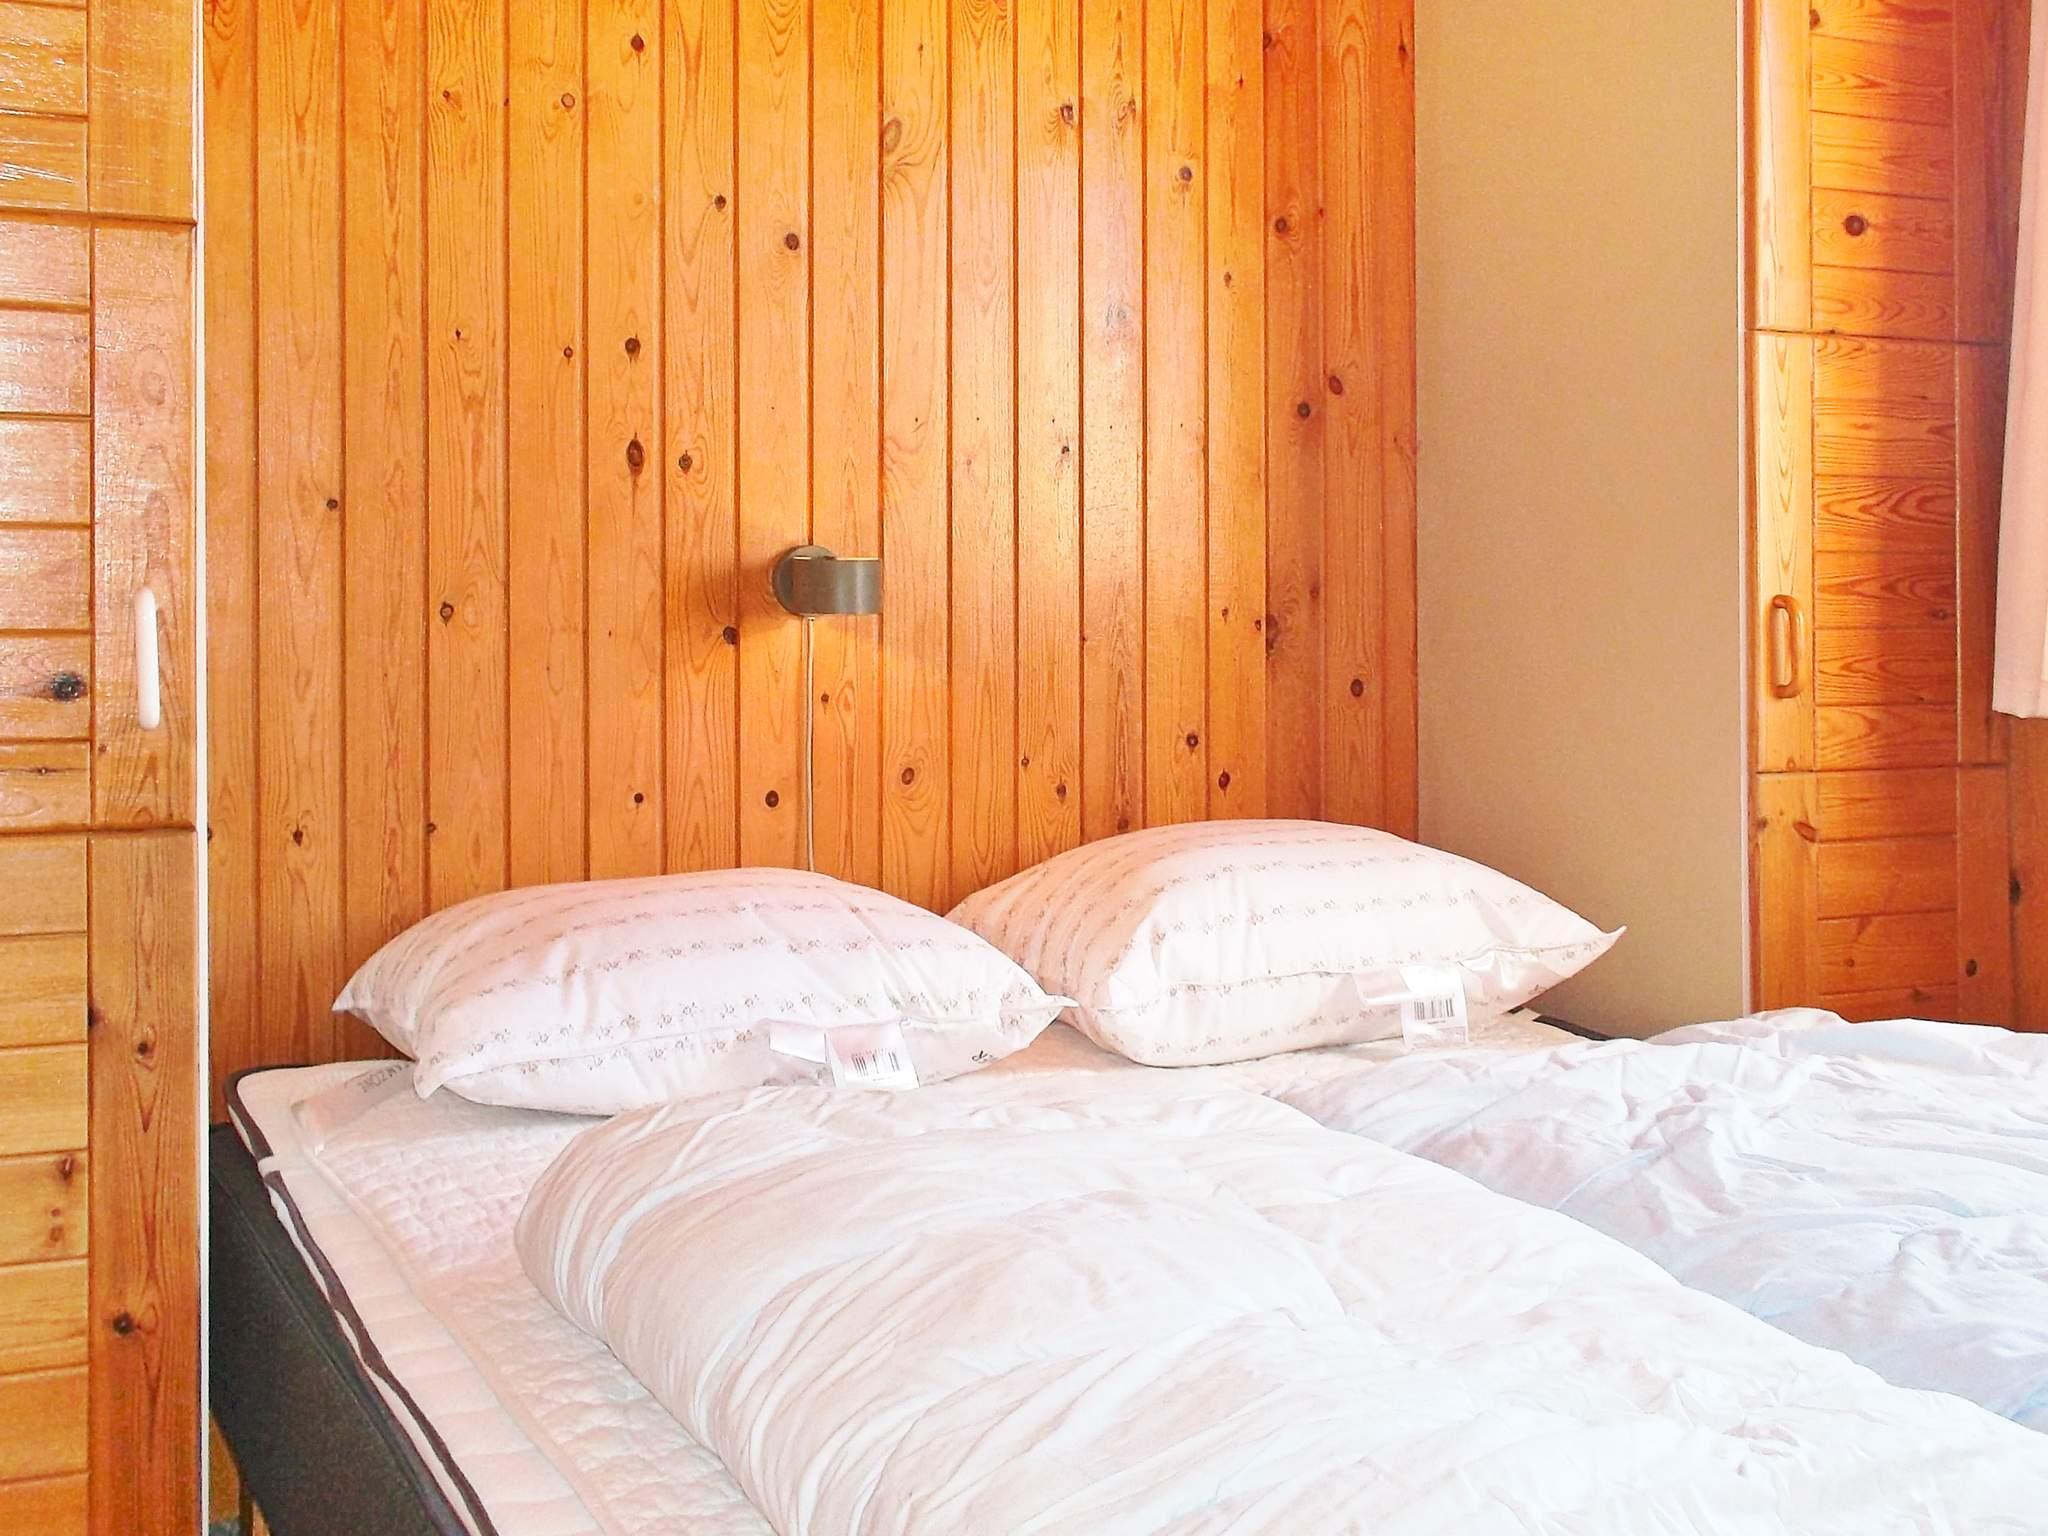 Ferienhaus Vrist (83580), Vrist, , Limfjord, Dänemark, Bild 8